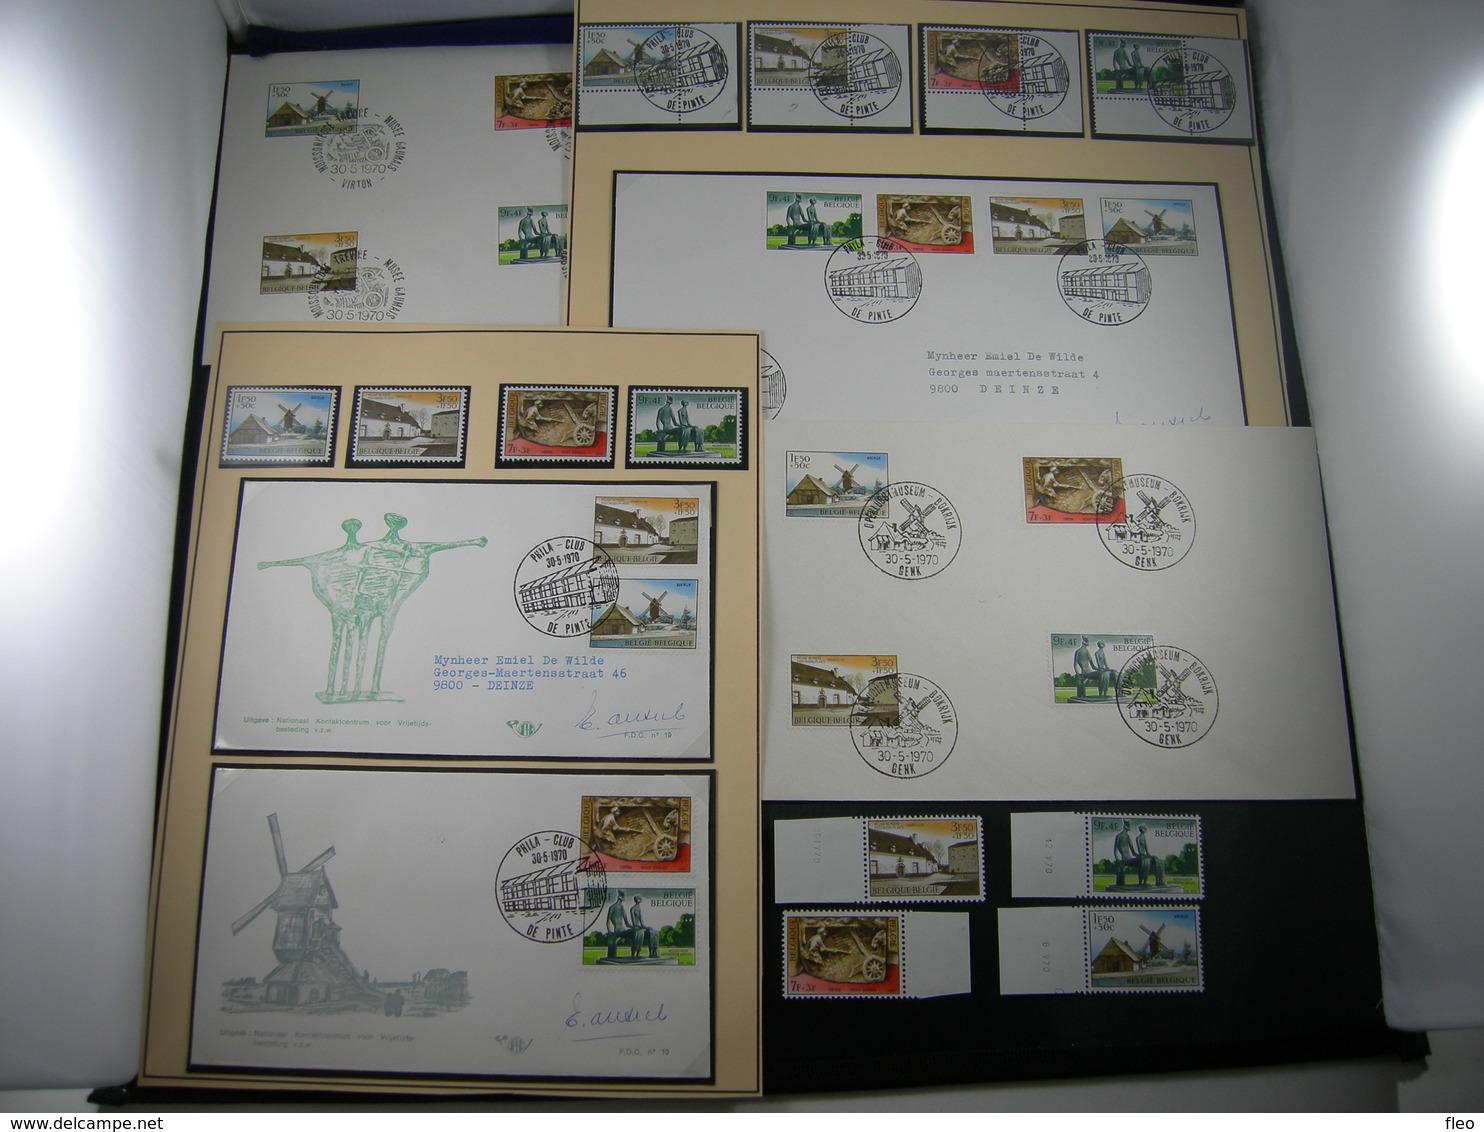 "BELG.1970 1532 1533 1534 & 1535 LOT FDC's Timbres/zegels Al.  ""- Culturelles - Musées - Culturele Uitgifte - Musea"" - FDC"